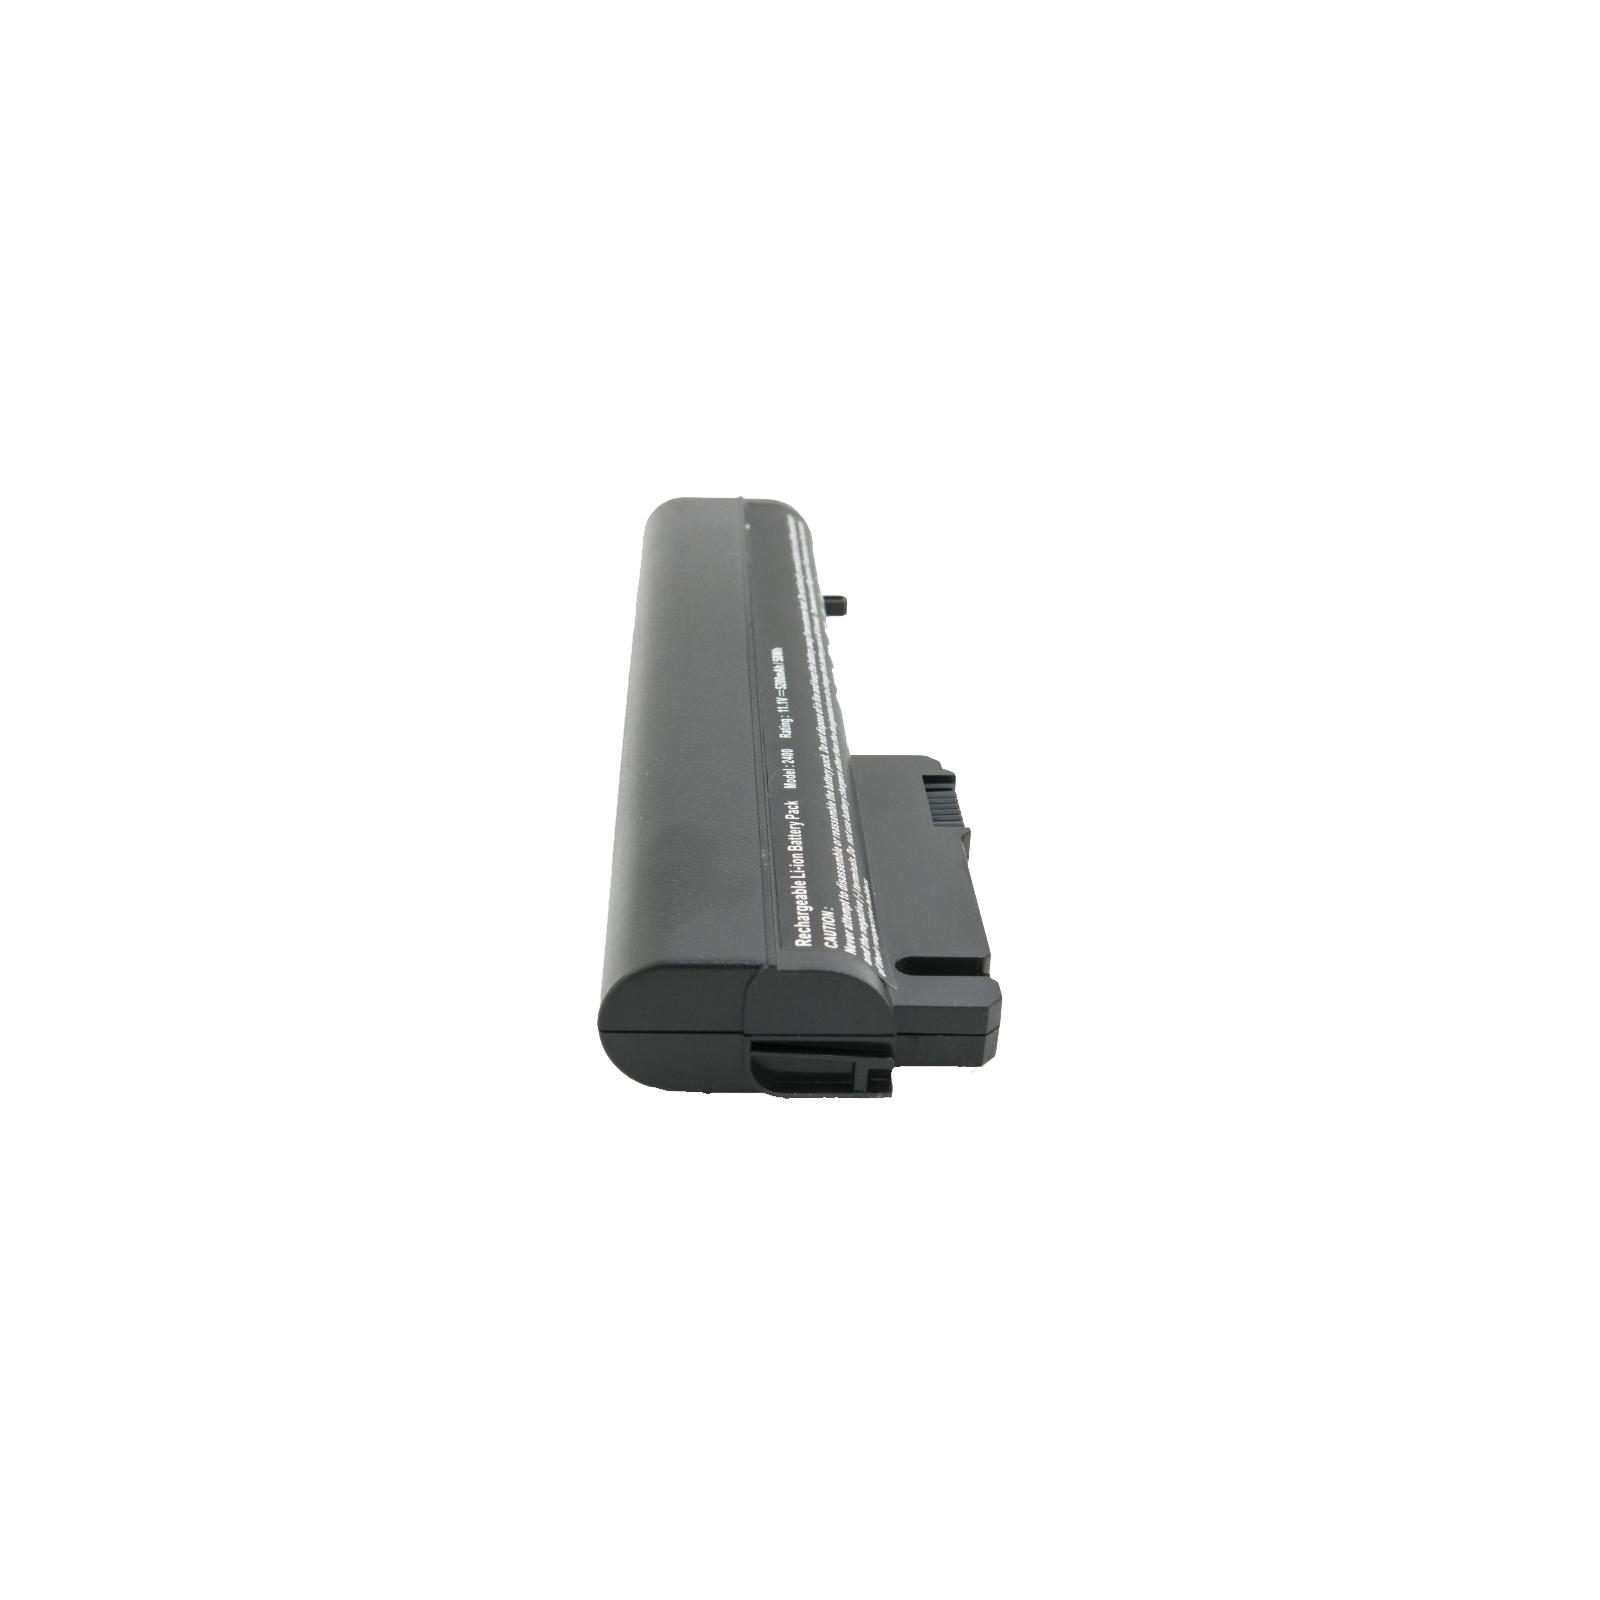 Аккумулятор для ноутбука HP Business Notebook NC2400 (HSTNN-FB22) 5200 mAh EXTRADIGITAL (BNH3936) изображение 5